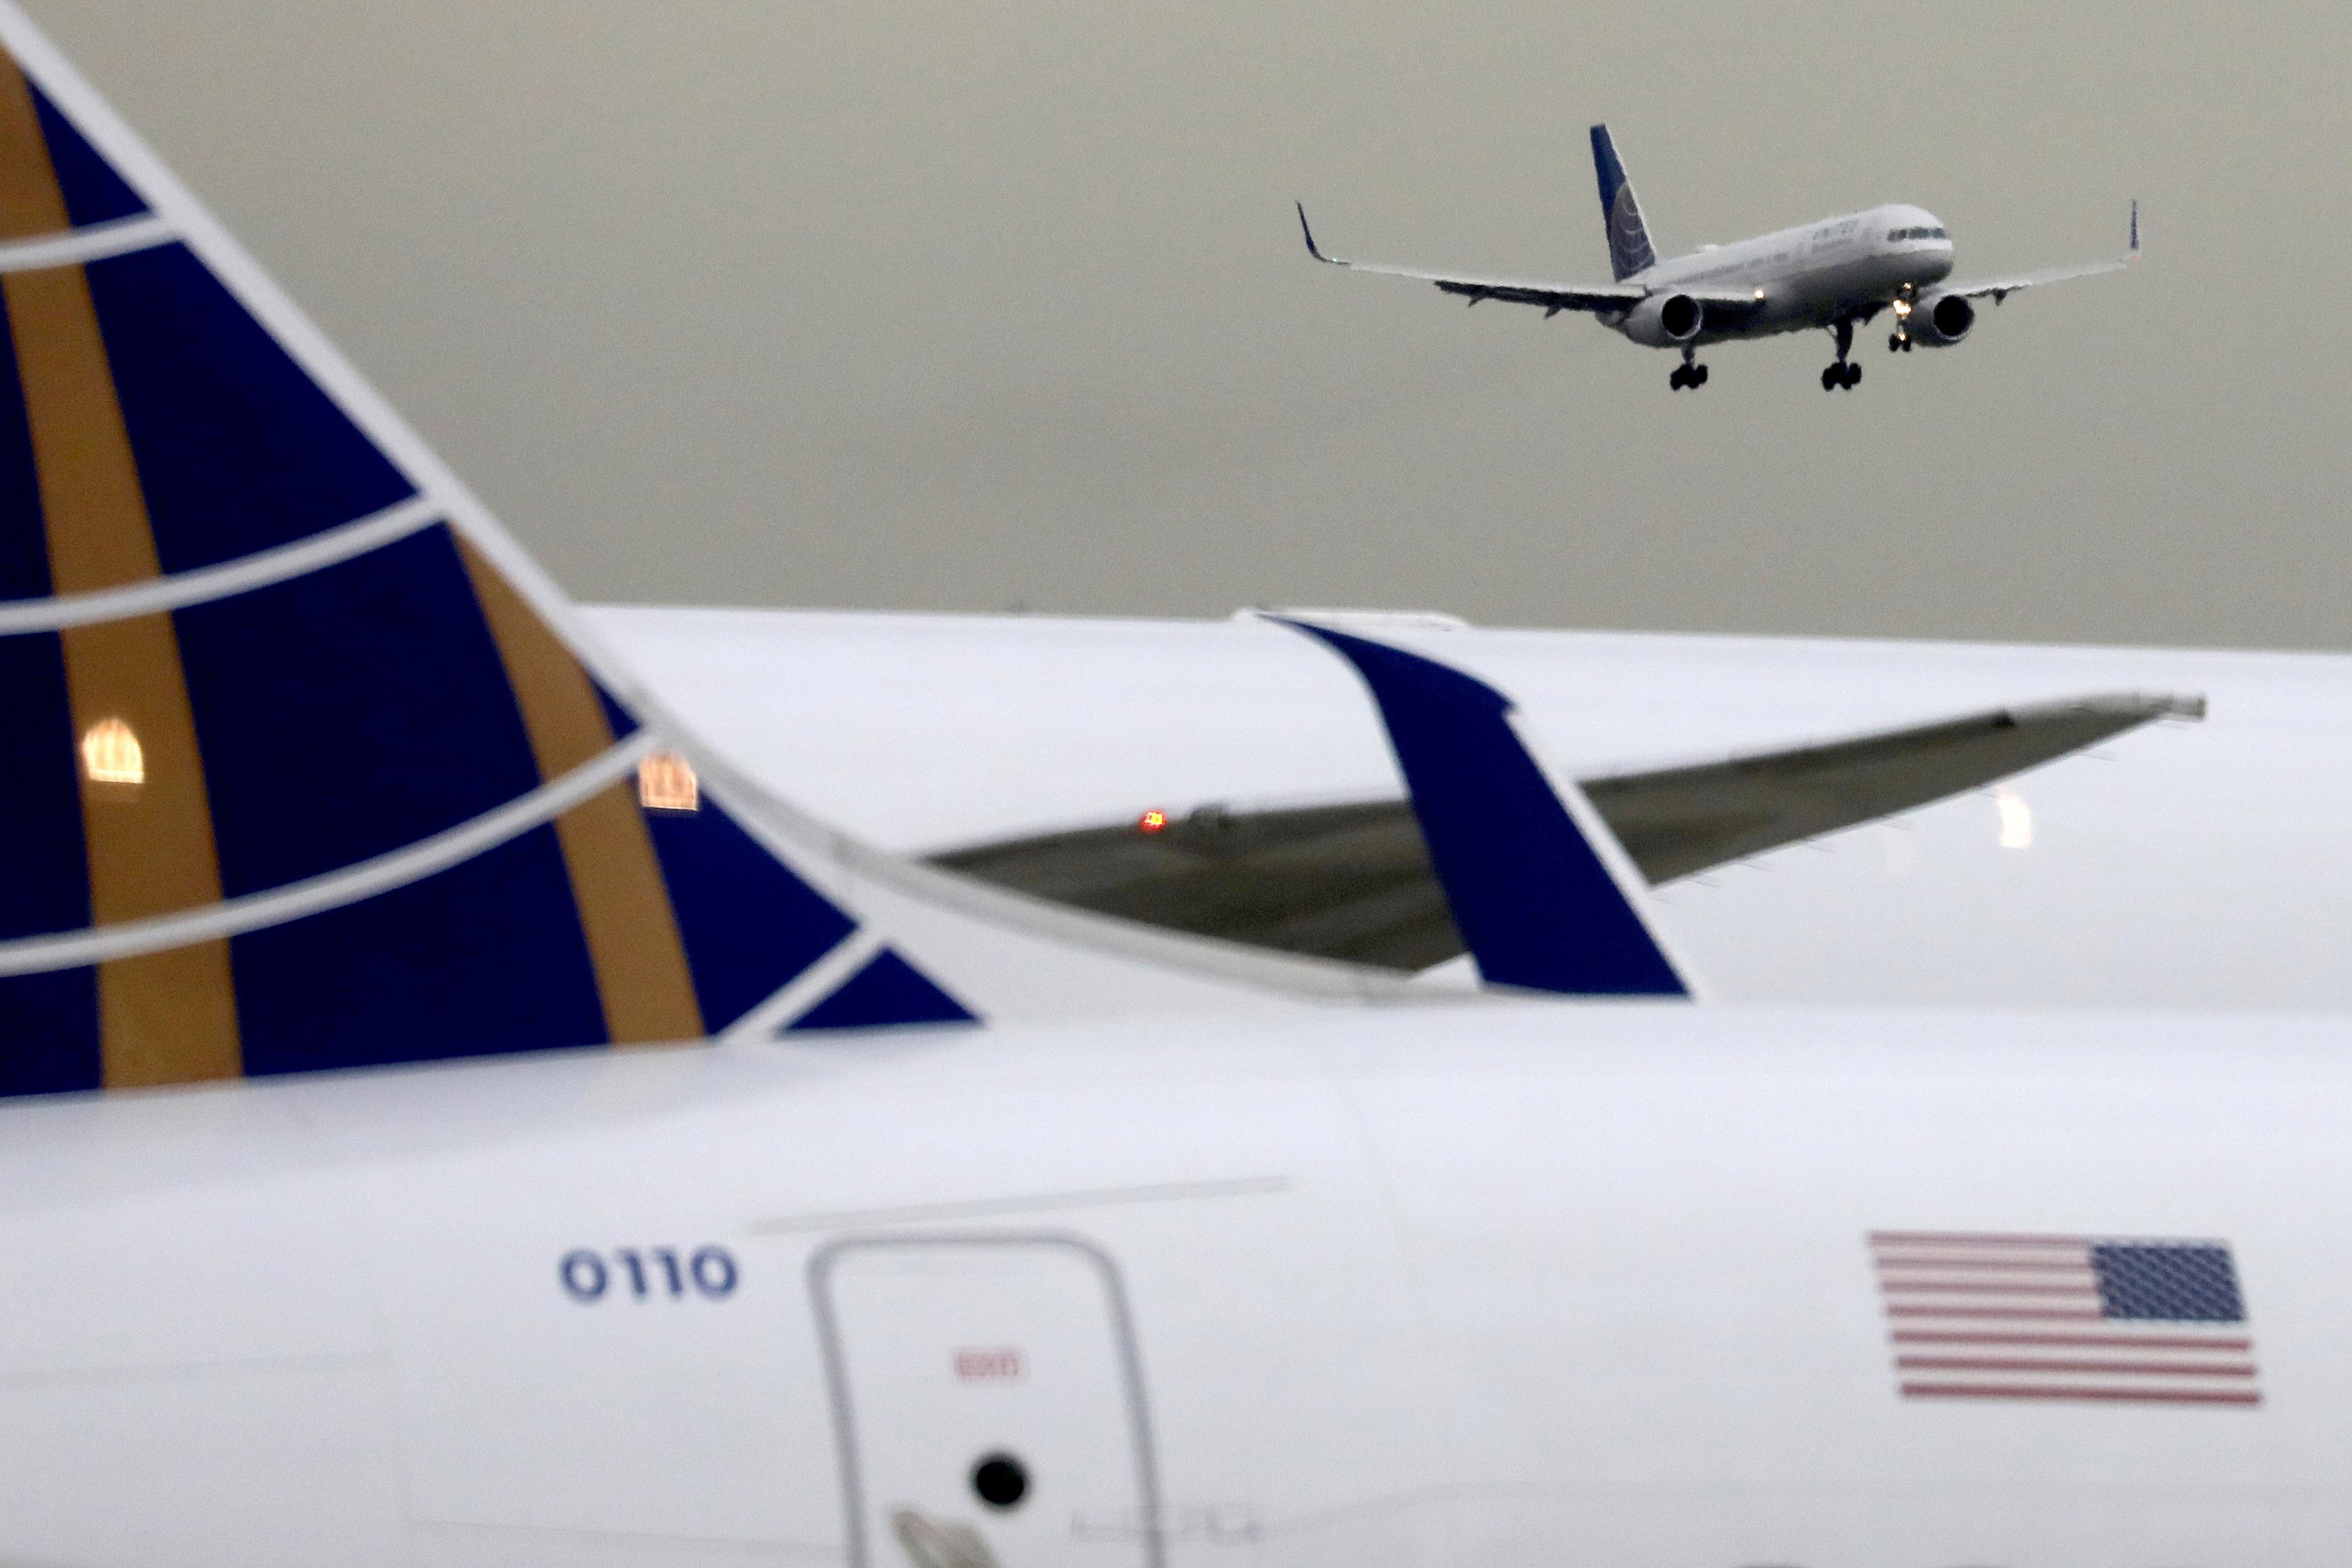 A United Airlines passenger jet lands at Newark Liberty International Airport, New Jersey, U.S. December 6, 2019. REUTERS/Chris Helgren/File Photo